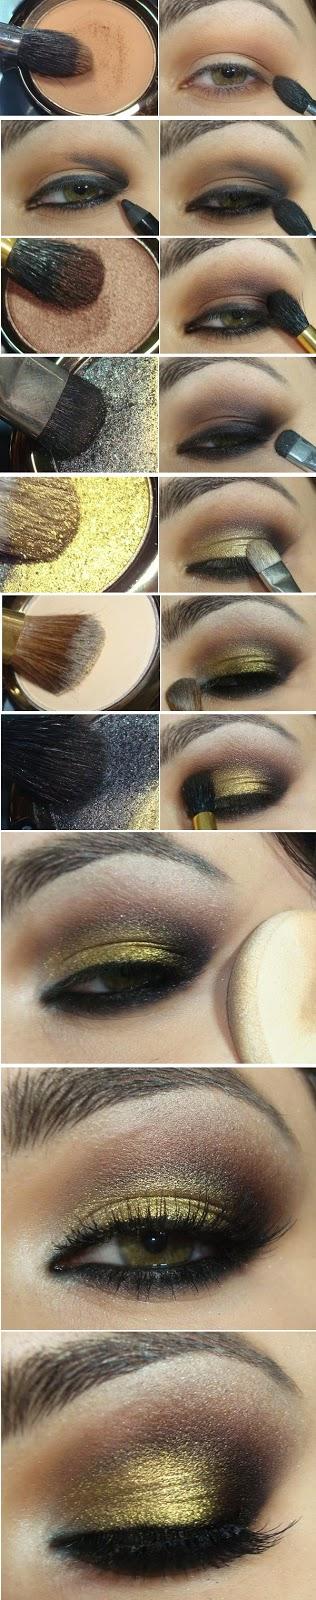 7 Maquillage chic